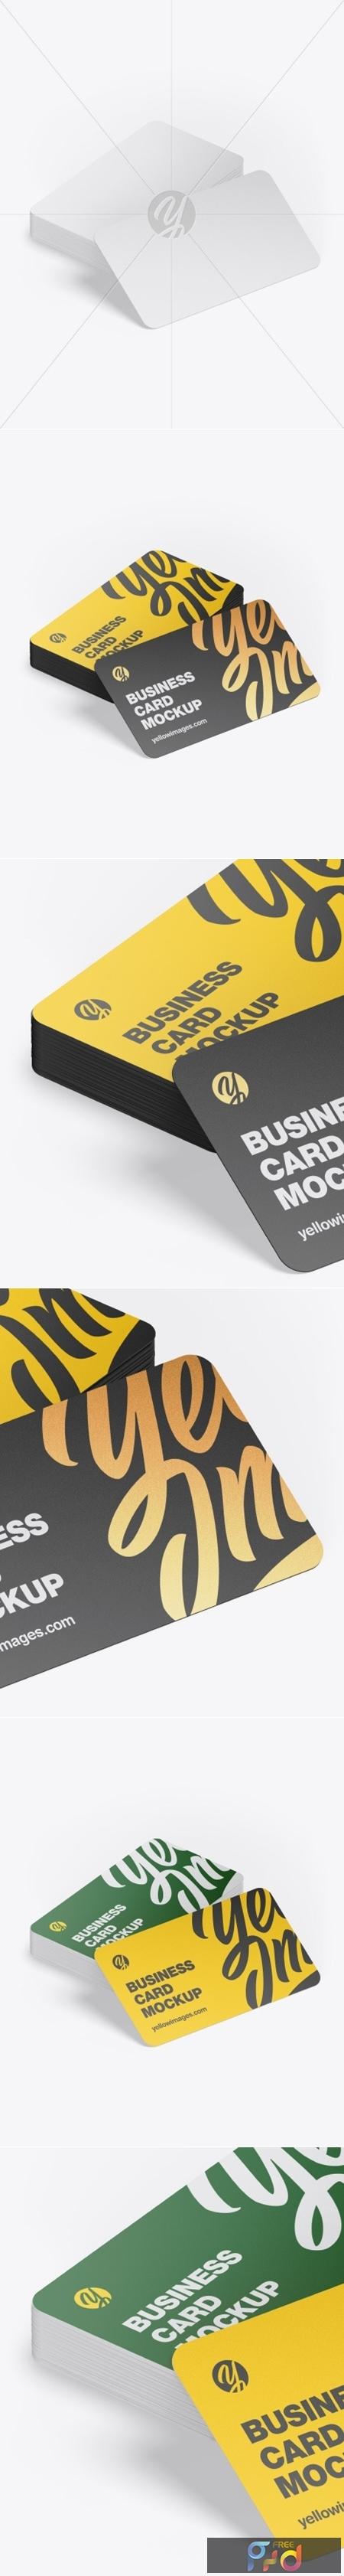 Free Psd Mockup Card